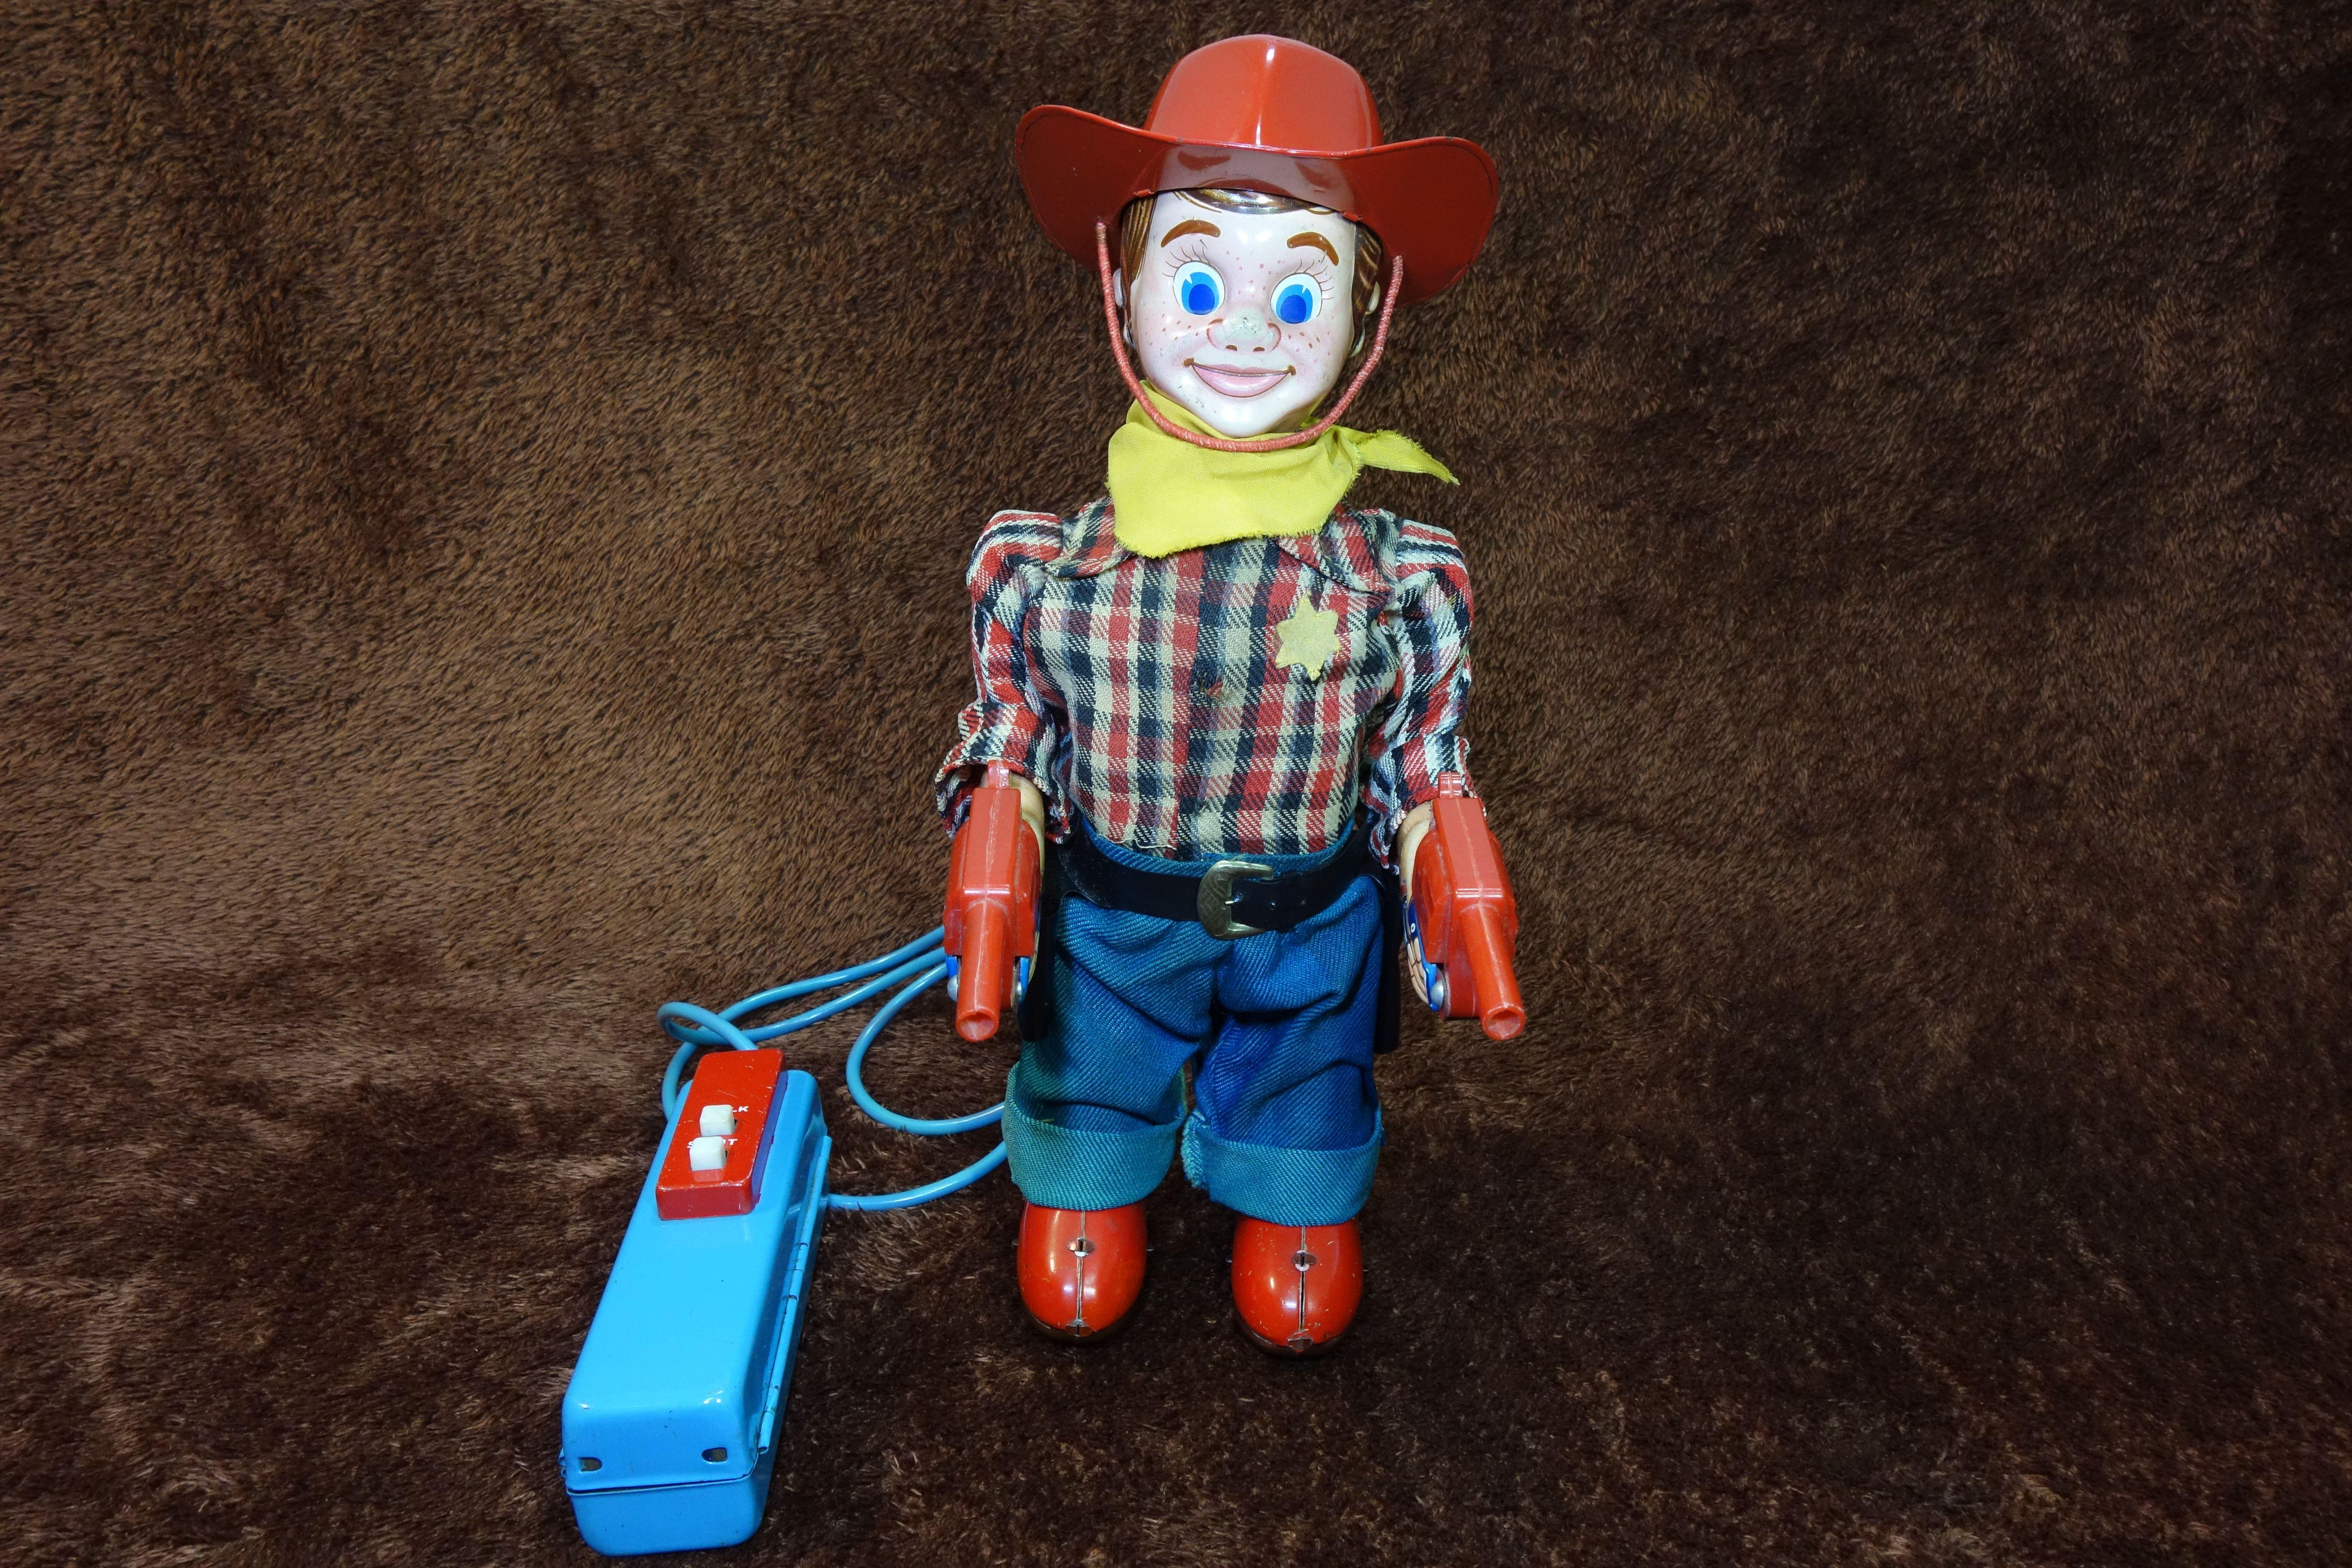 Yonezawa Marshal Wild Bill Cowboy.